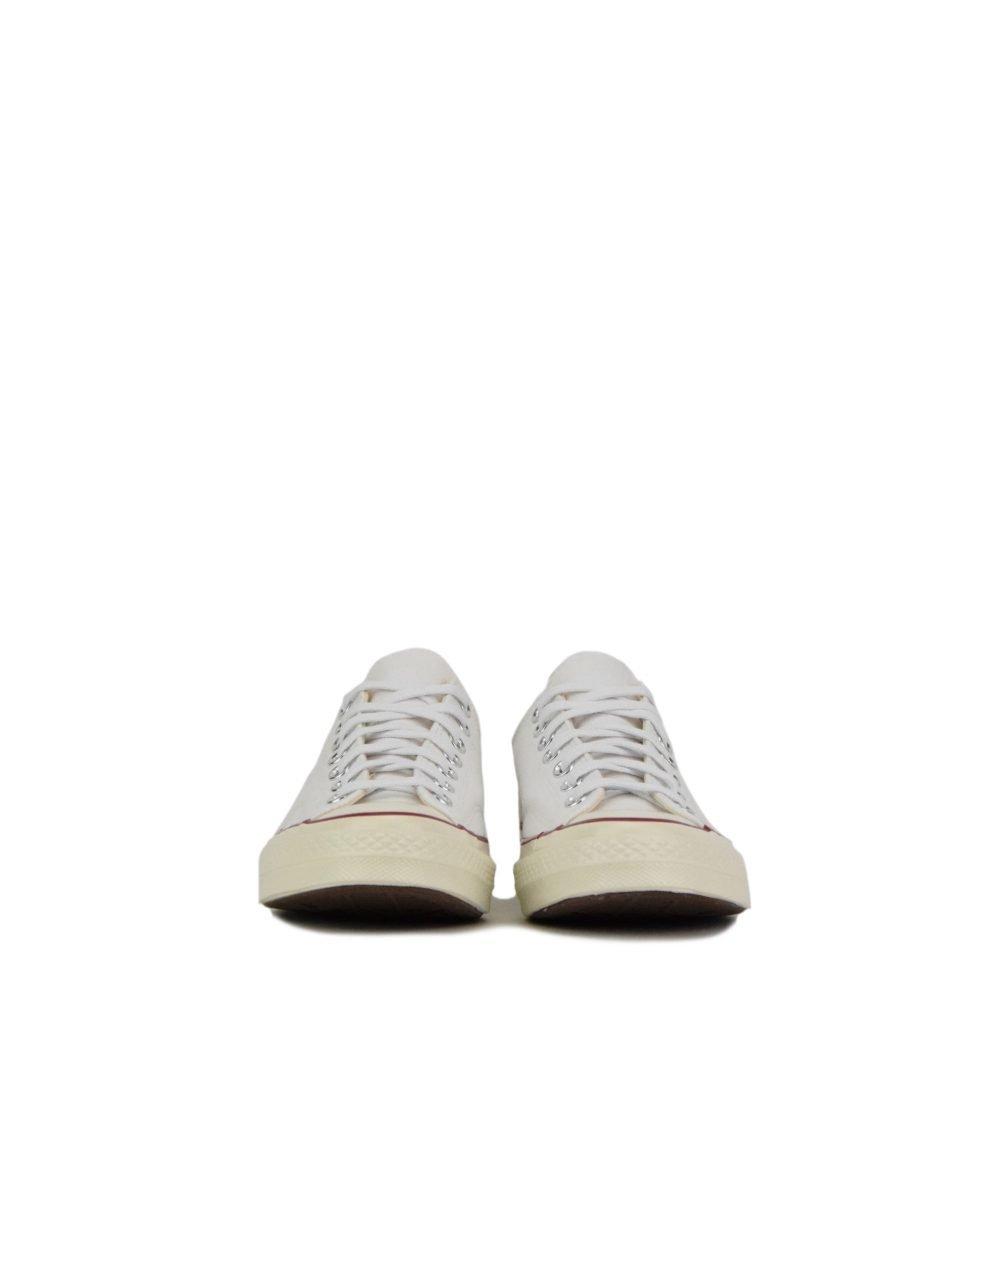 Converse Chuck 70 OX (162065) White/Garnet